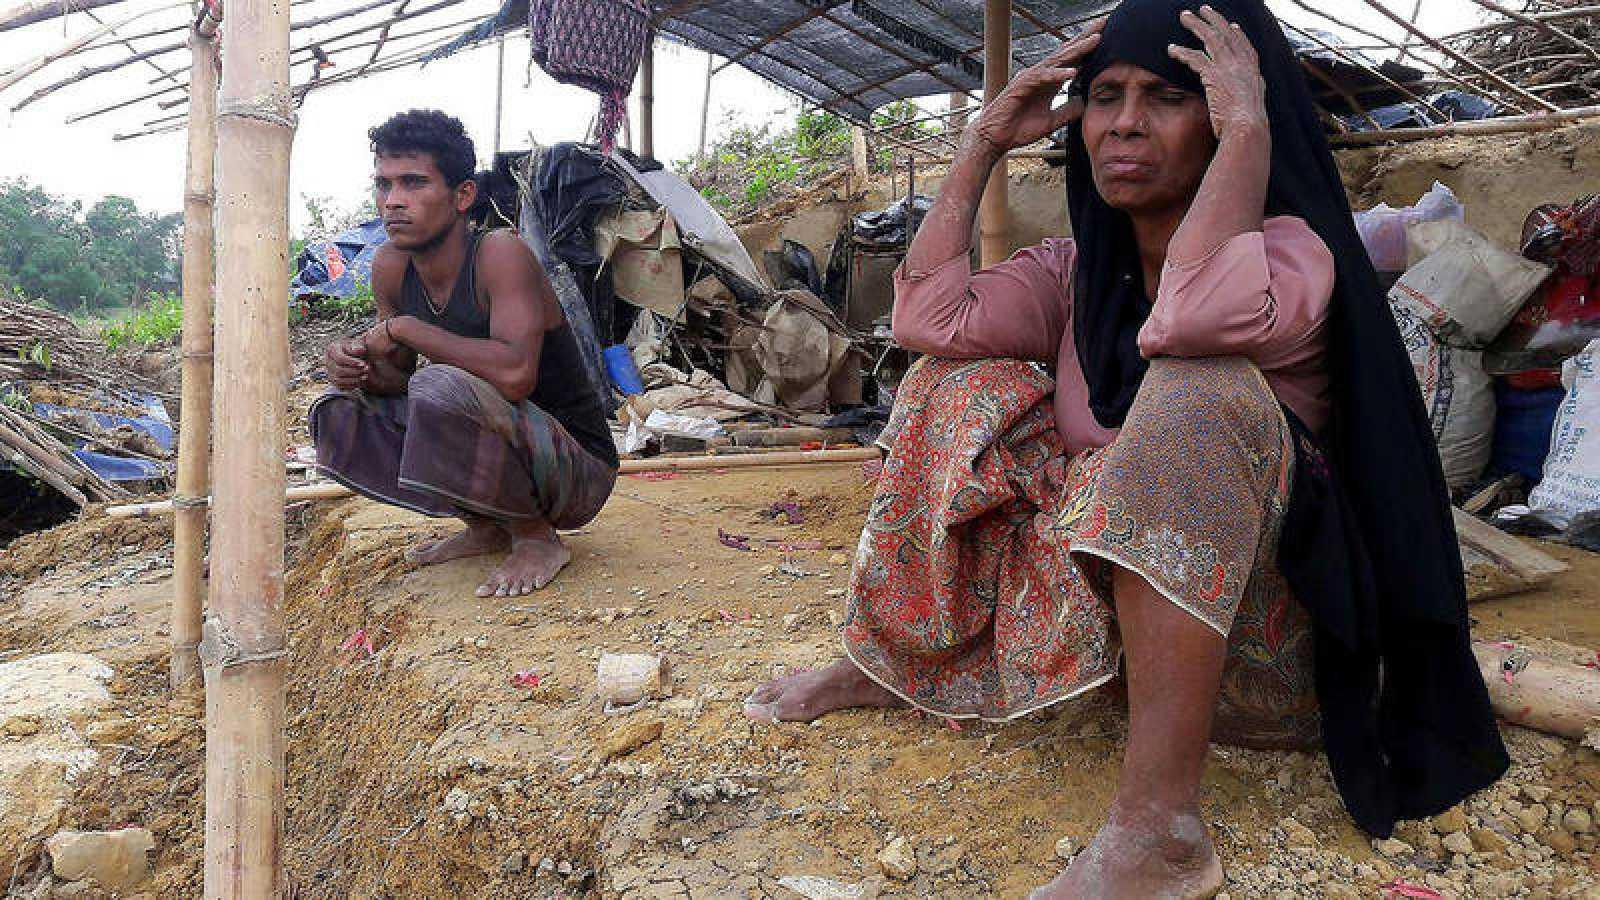 Refugiados rohinyá en un campo destruido por un ciclón en Birmania